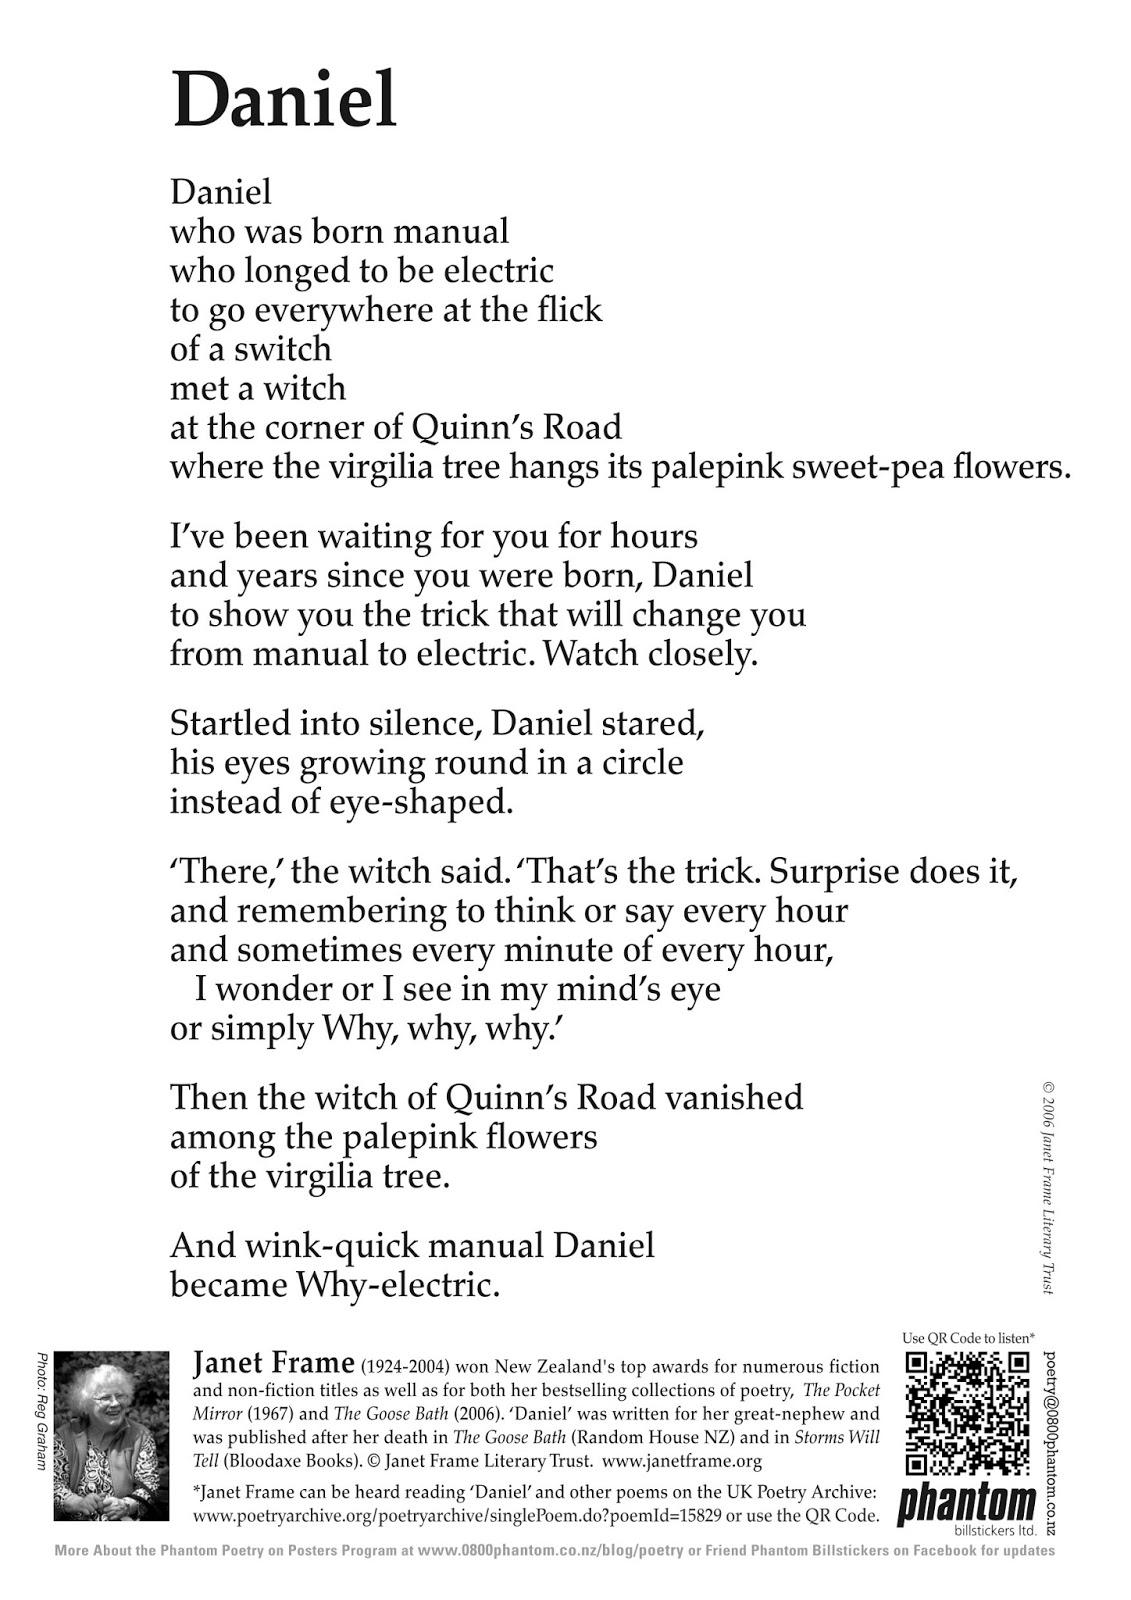 An Angel @ My Blog: Janet Frame\'s Phantom Billstickers Poem Posters